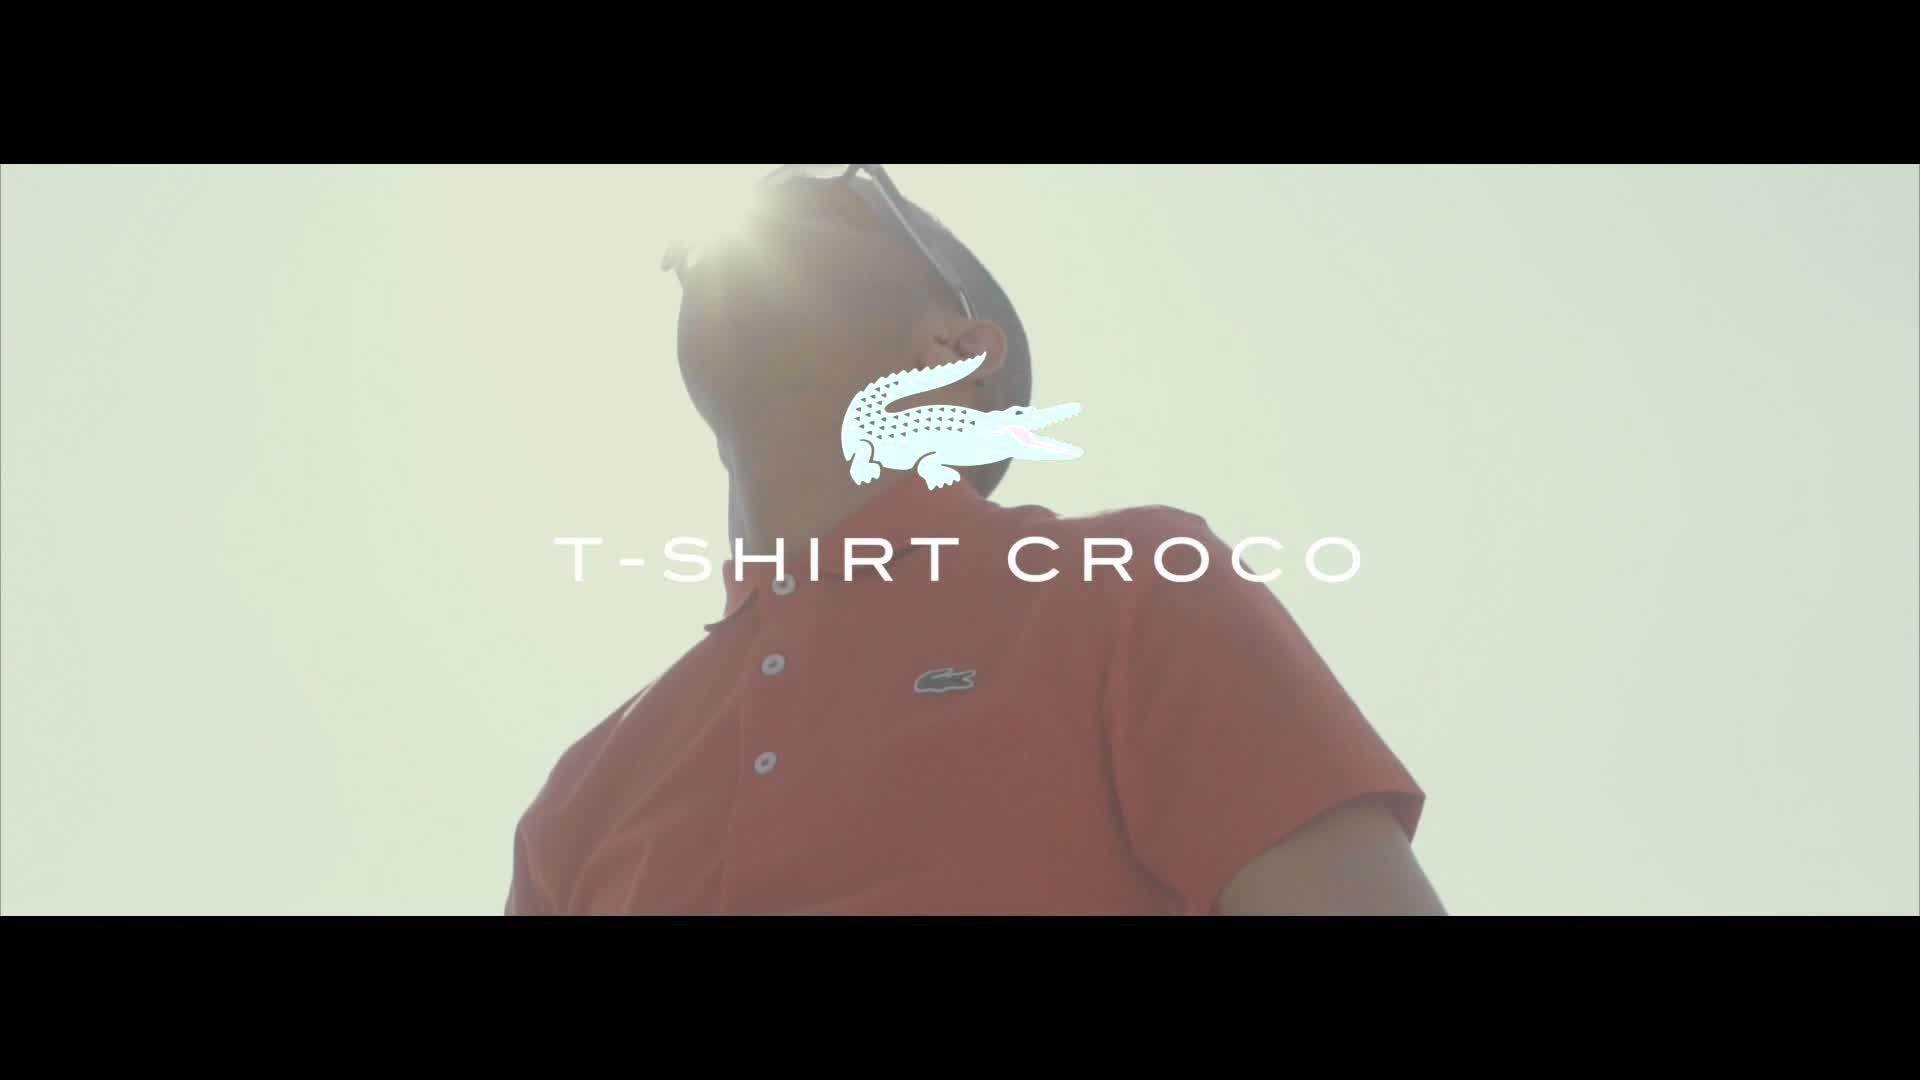 naps-t-shirt-croco-official-video